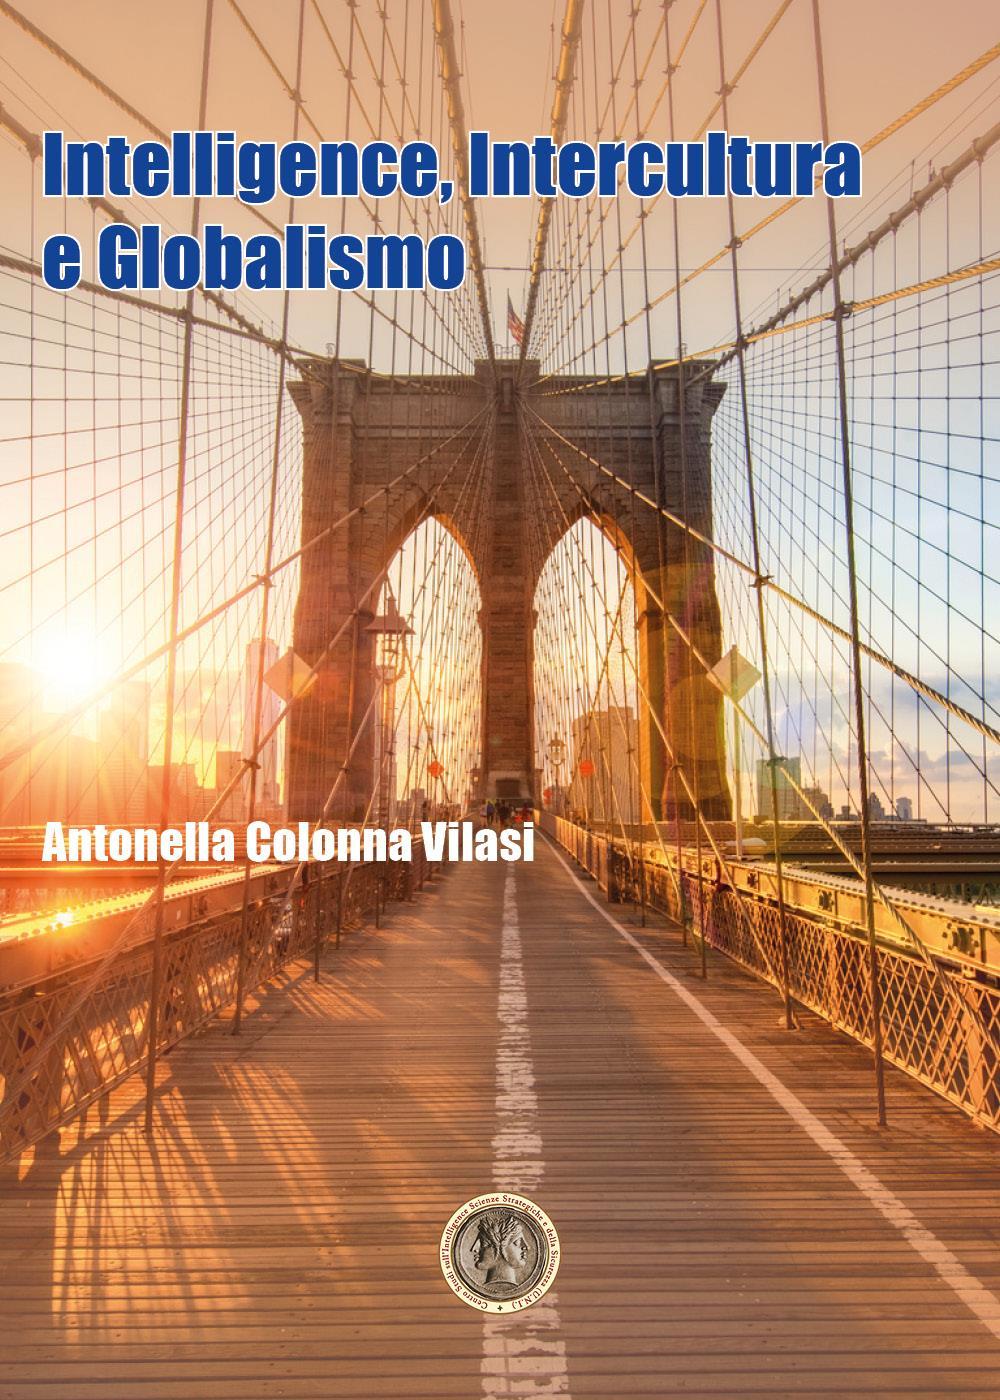 Intelligence, Intercultura e Globalismo